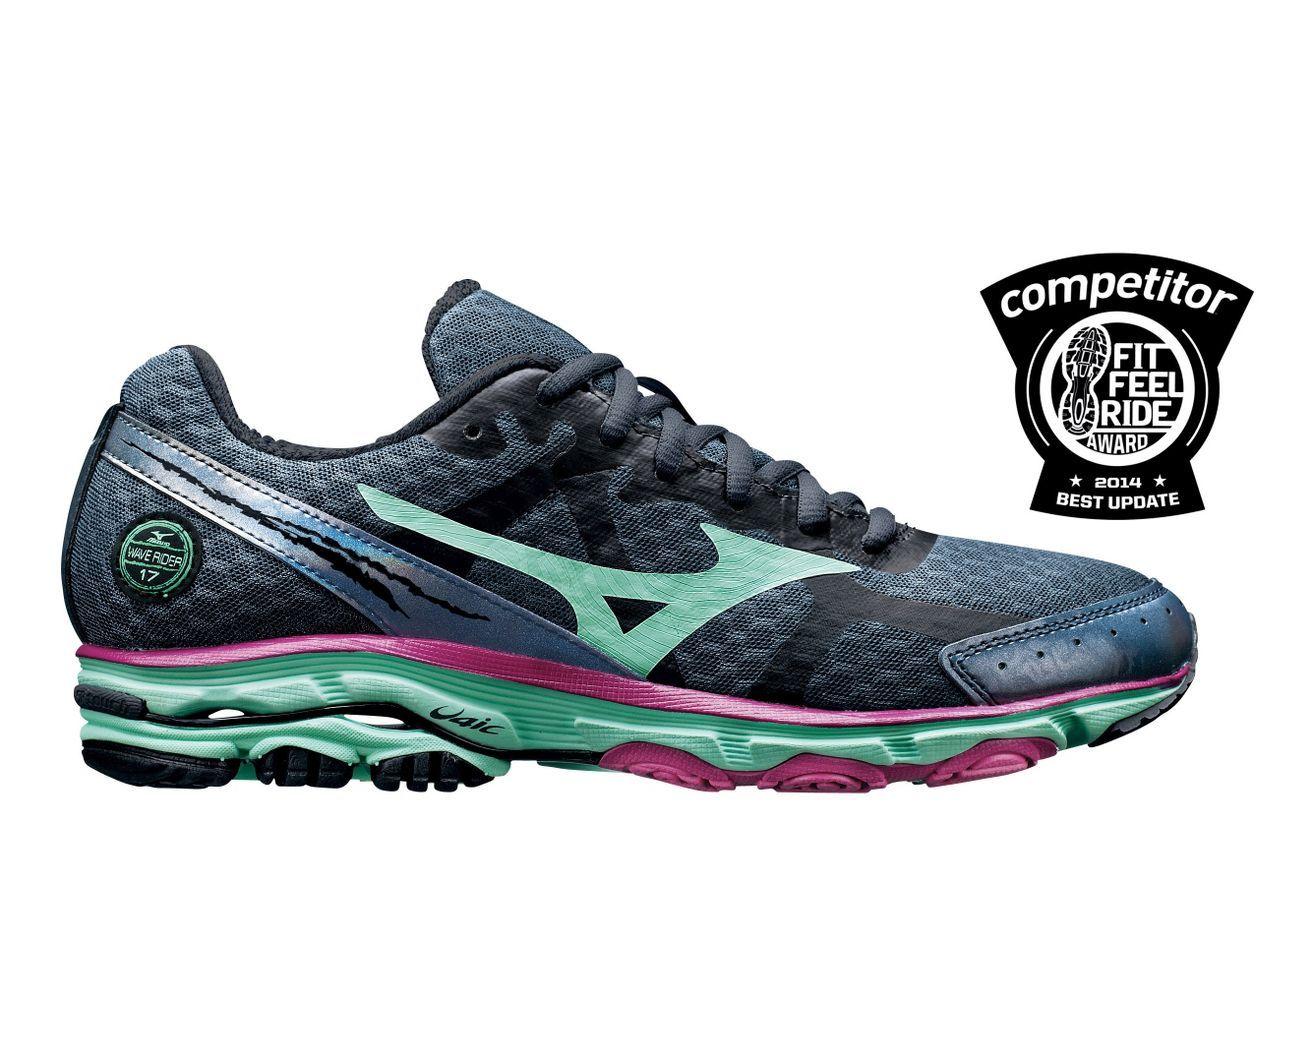 Triathlon running shoes, Mizuno shoes